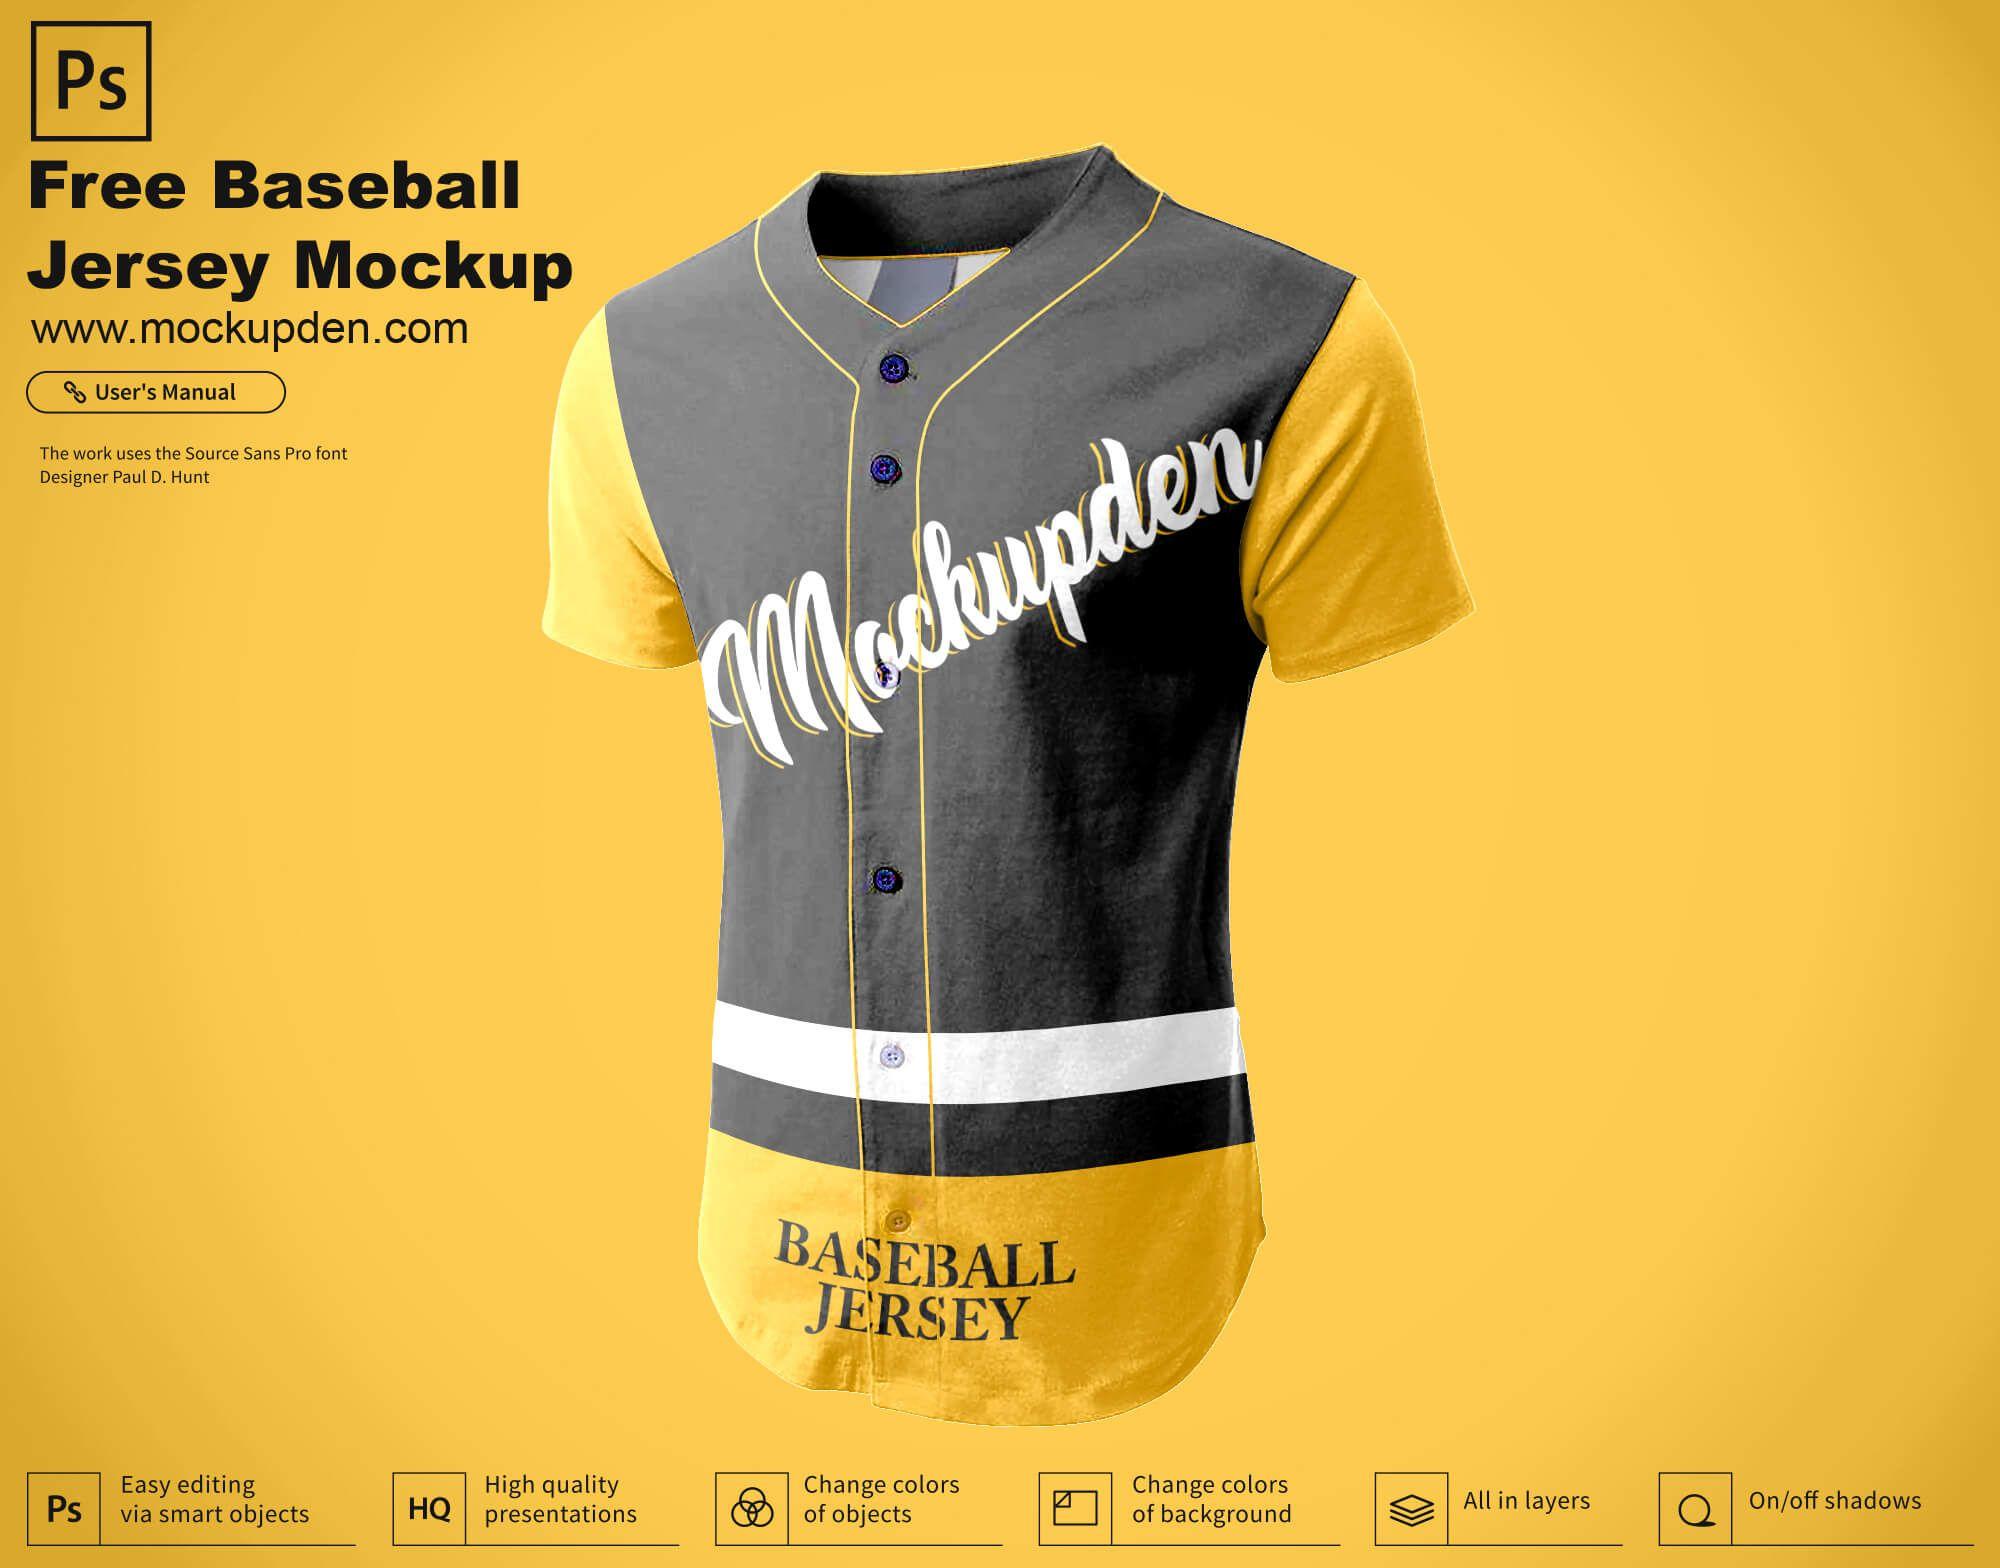 Download Free Baseball Jersey Mockup Psd Template Baseball Jerseys Clothing Mockup Jersey